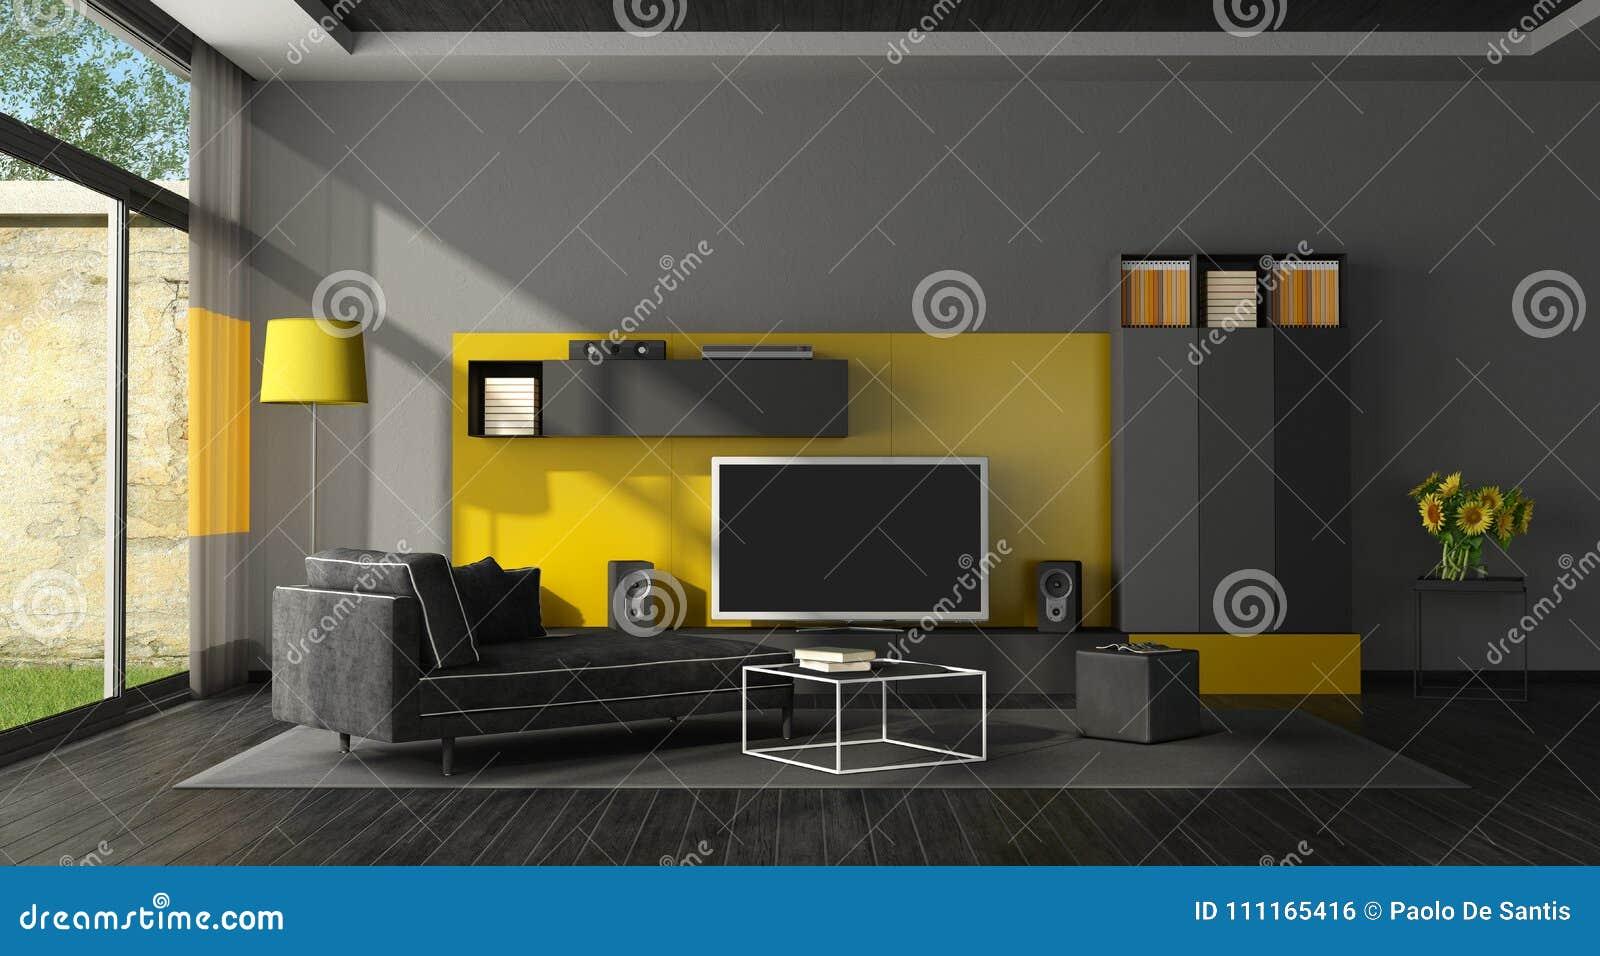 Black And Yellow Living Room With Tv Set Stock Illustration Illustration Of Cinema Light 111165416